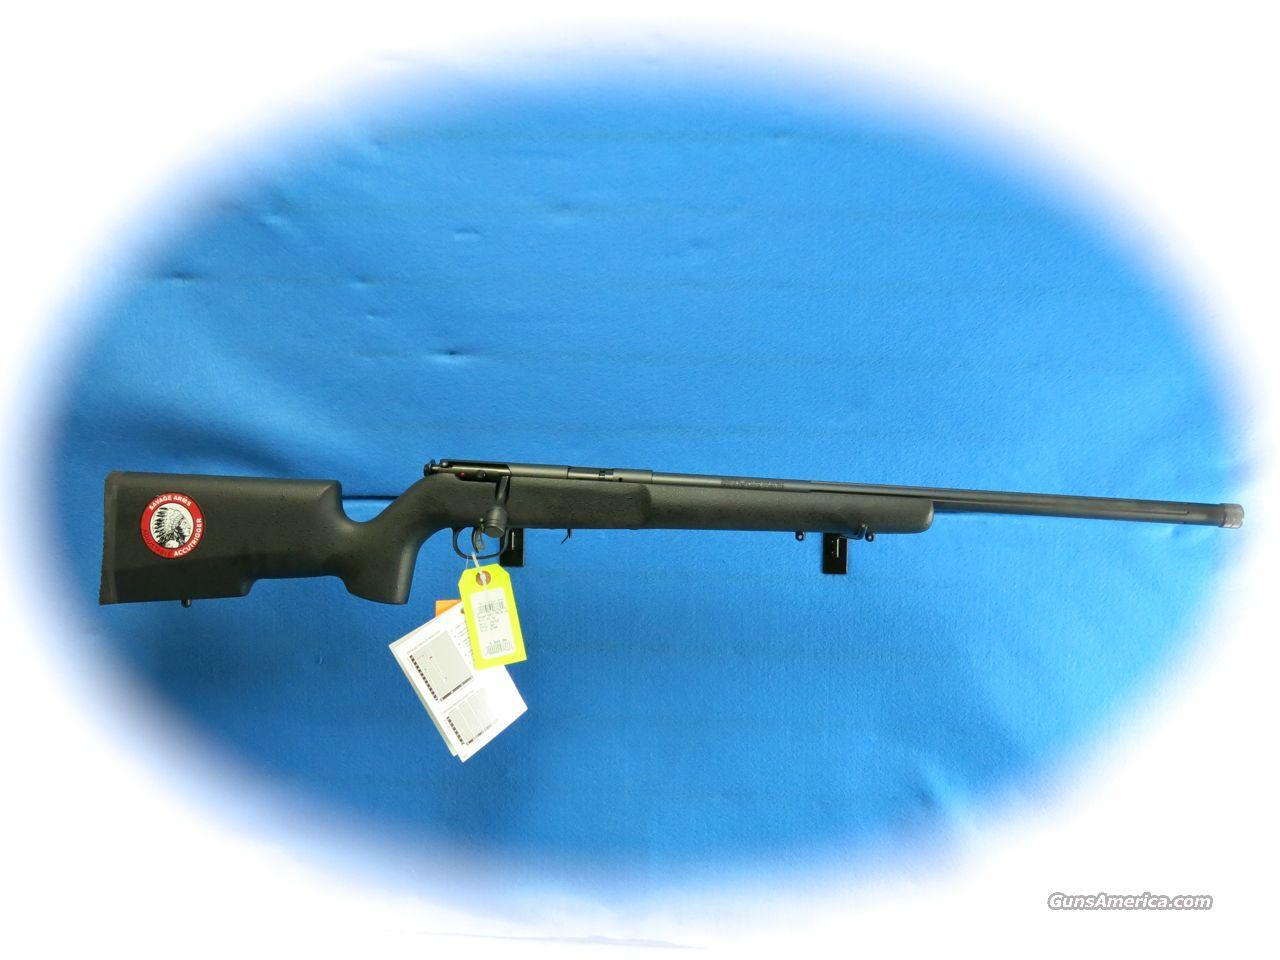 **SALE!!** Savage 93R17 TRR-SR Bolt Action Rifle .17 HMR W/Threaded Barrel **New**  Guns > Rifles > Savage Rifles > Accutrigger Models > Sporting